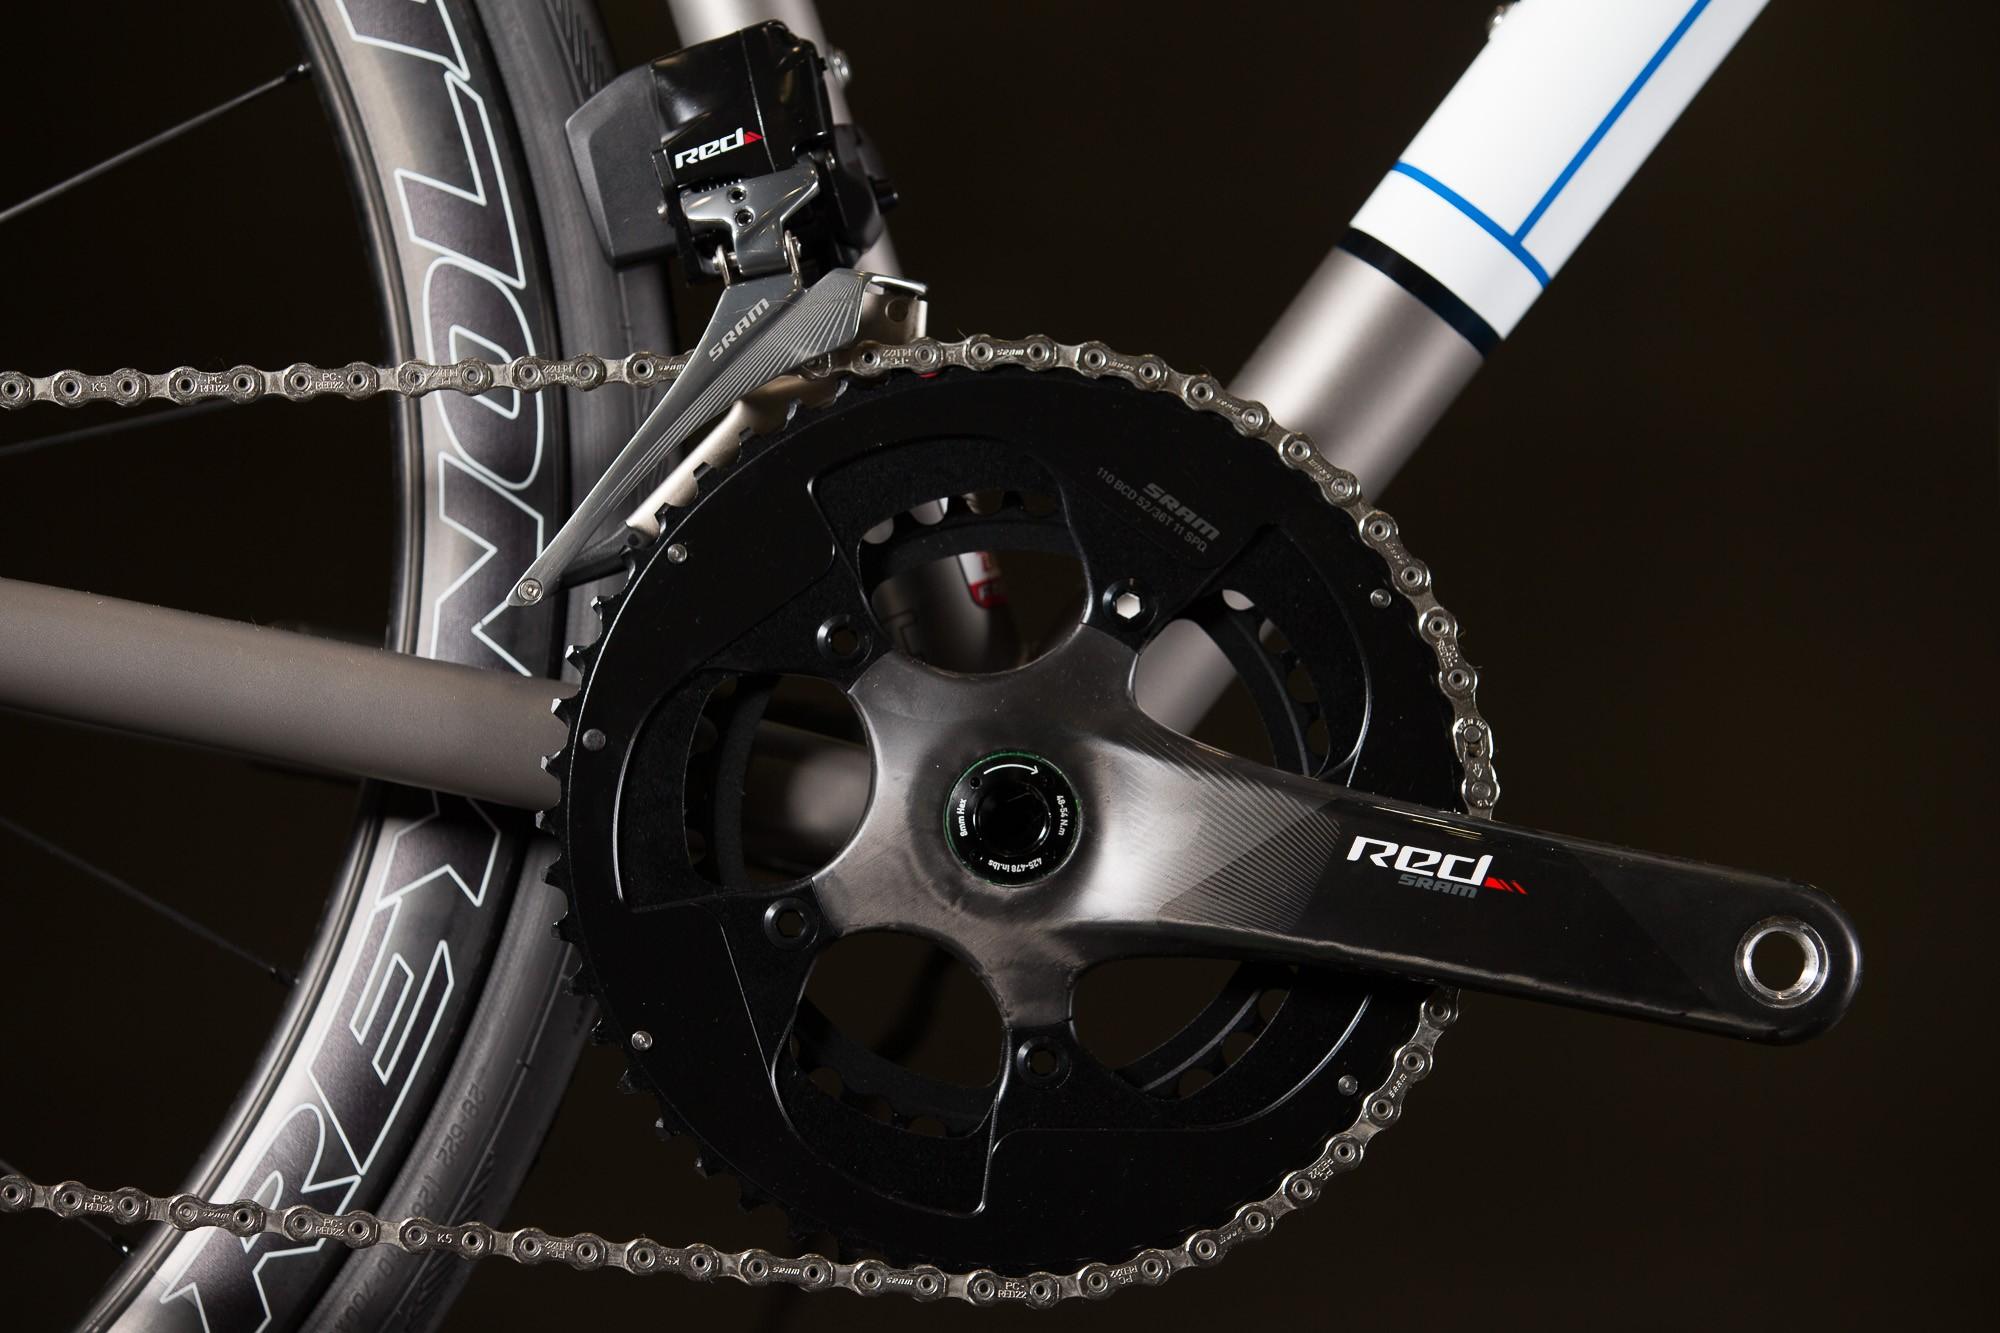 2016-NAHBS-Strong-Disc-Road-Bike-with-SRAM-RED-eTap-7-1335x890@2x.jpg